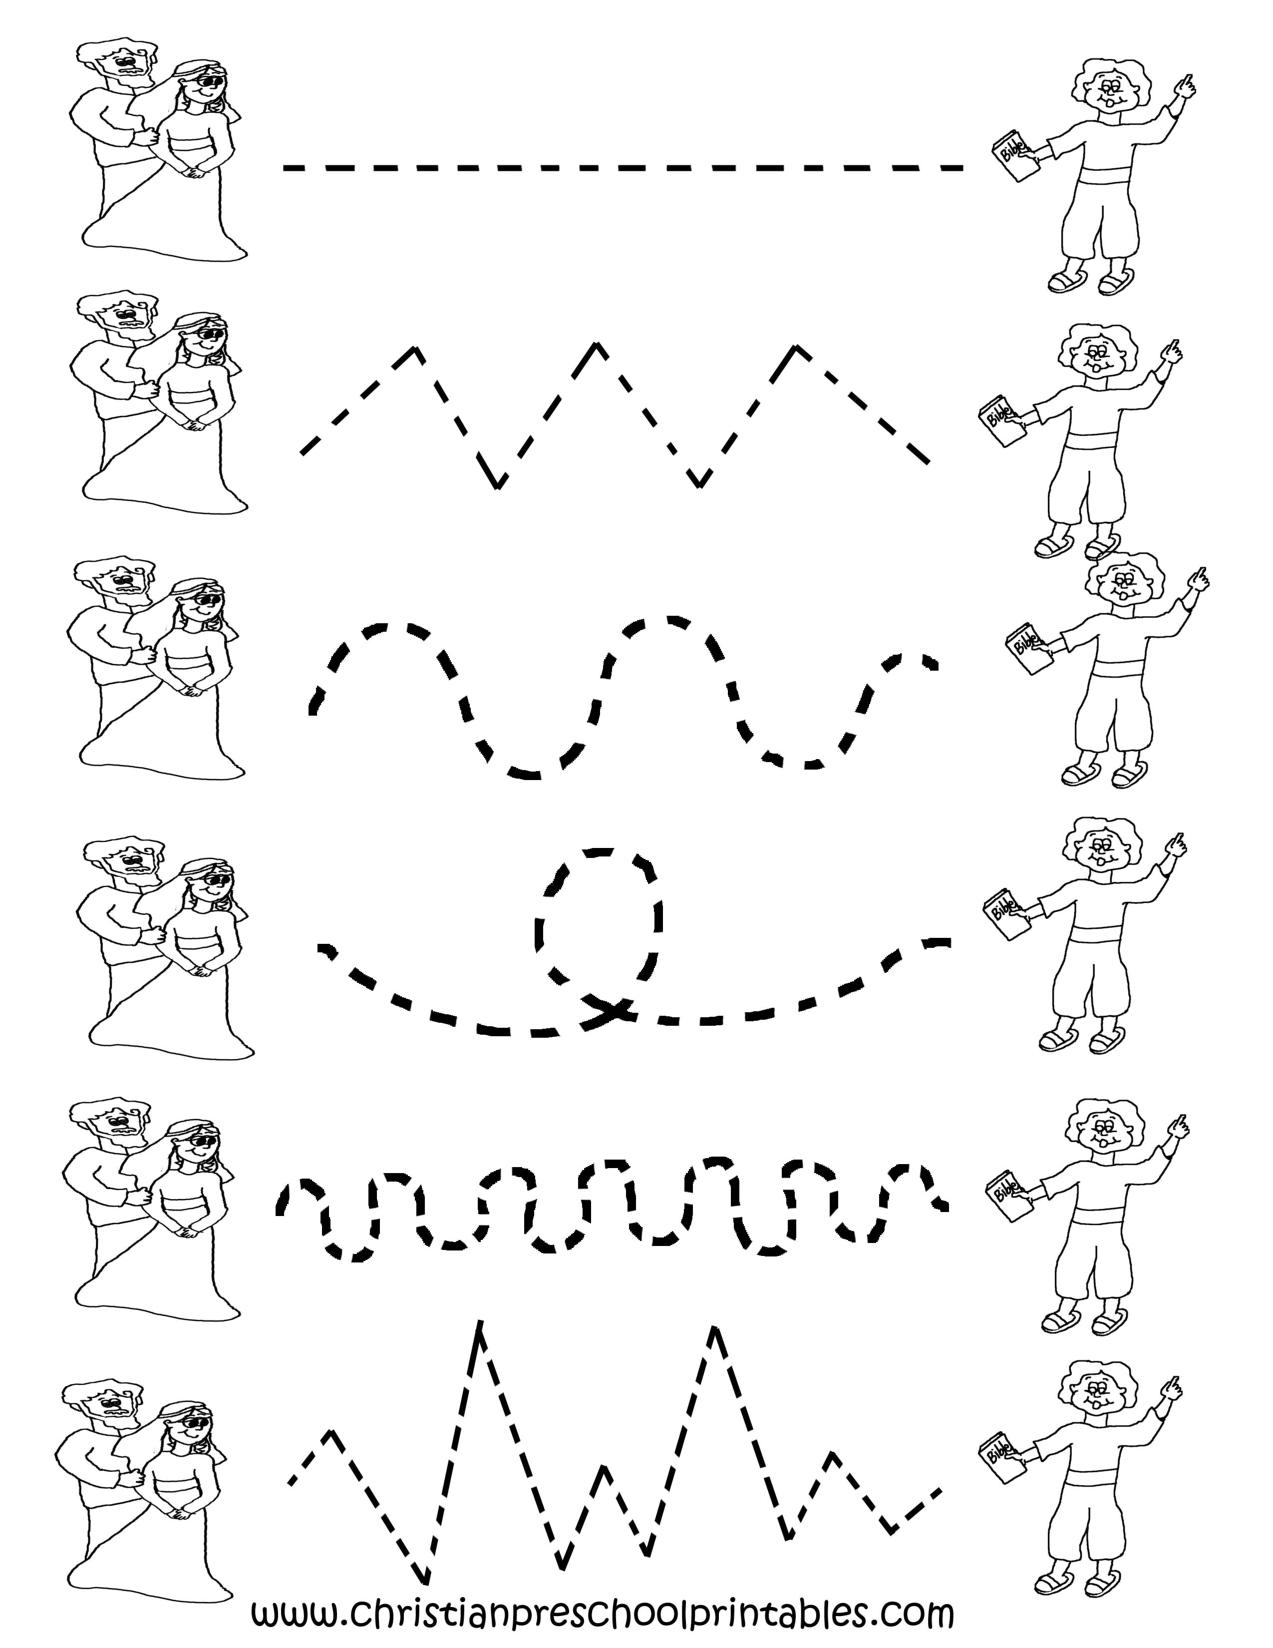 Image Detail For -Preschool Tracing Worksheets | Preschool Ideas | Printable Tracing Worksheets